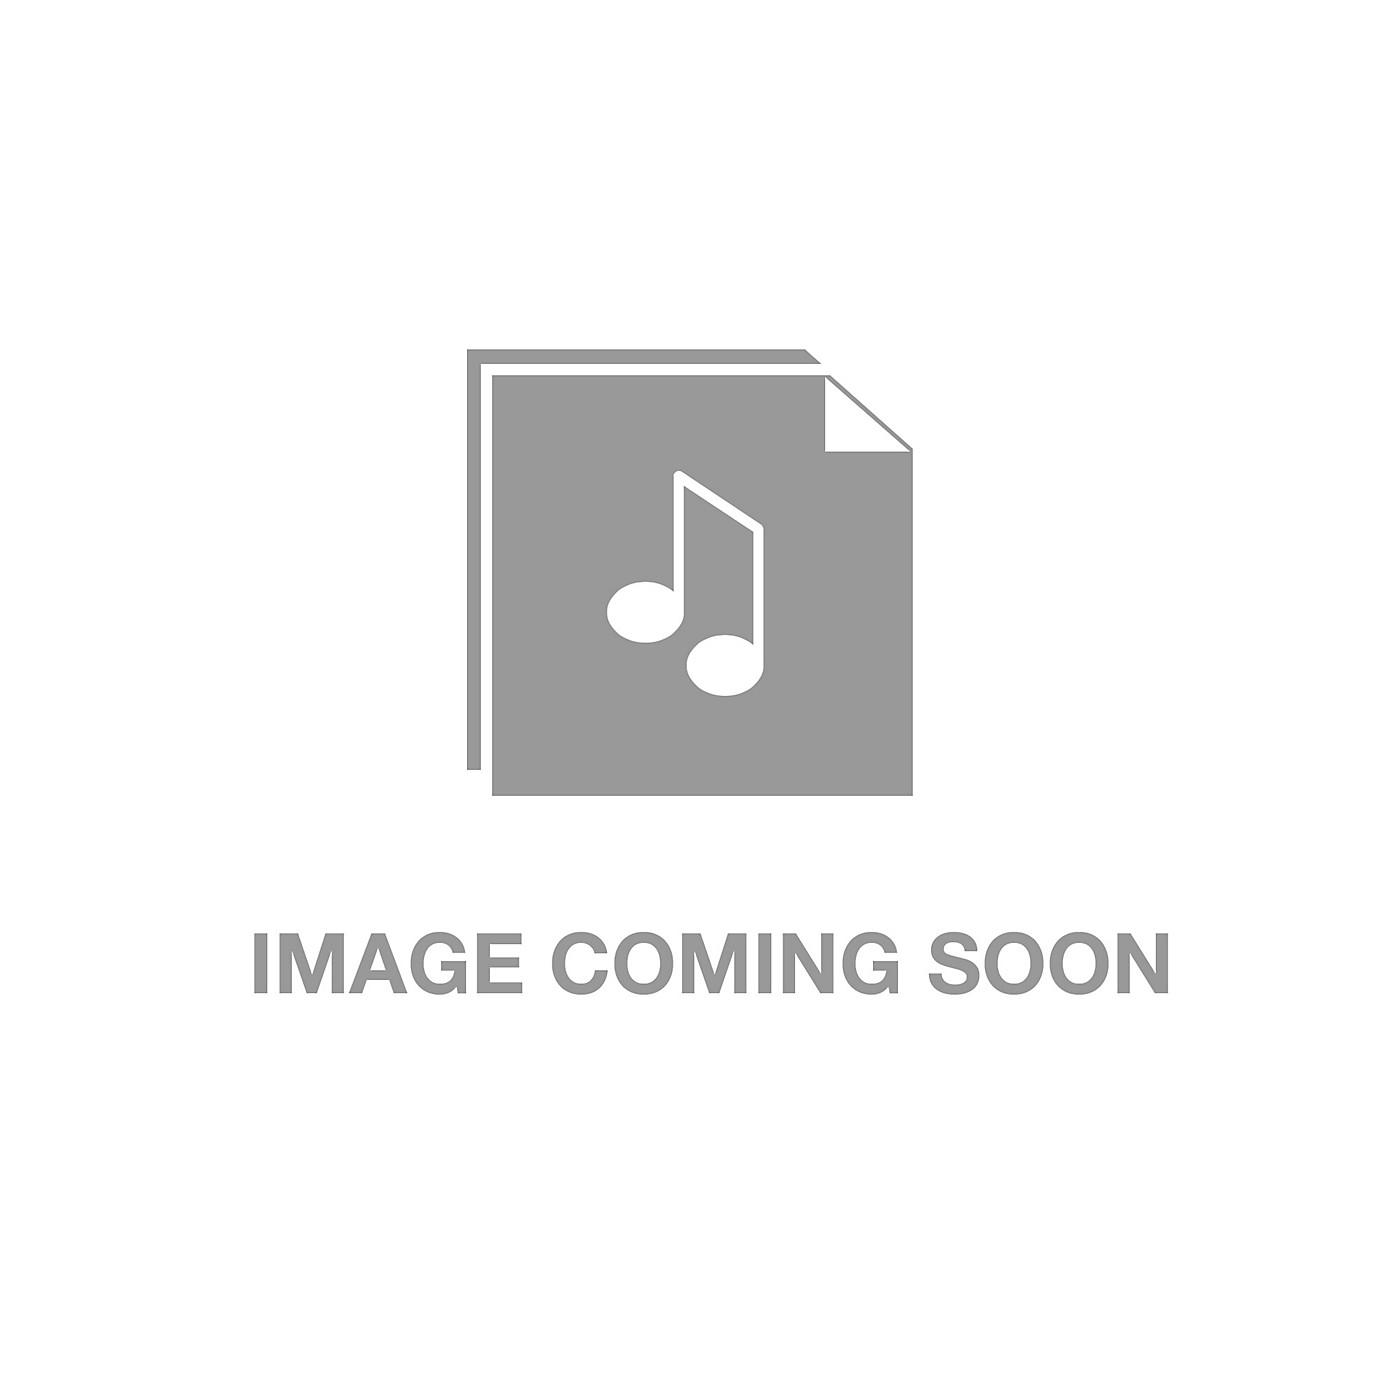 Hal Leonard Hal Leonard Intermediate Band Method (Oboe) Intermediate Band Method Series thumbnail